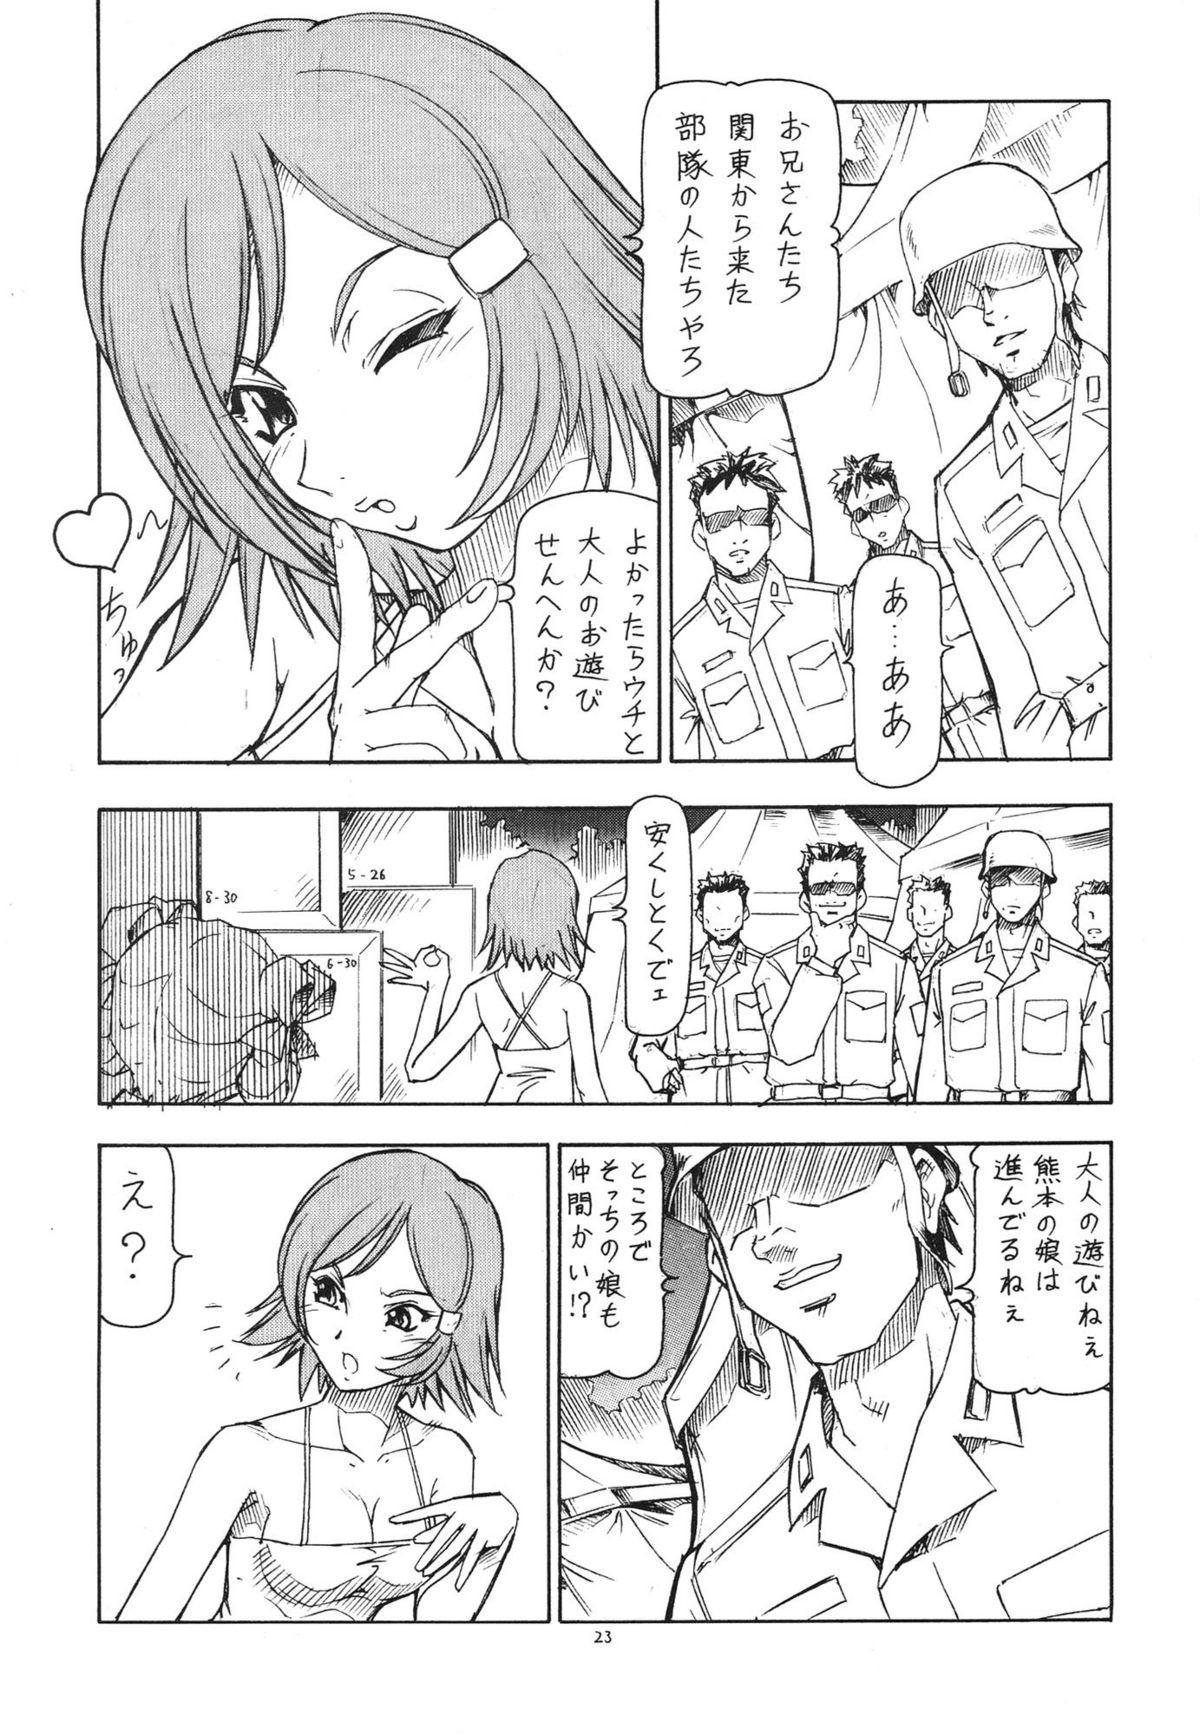 GPM.XXX Animation Moegiiro no Namida - Tear Drops 24